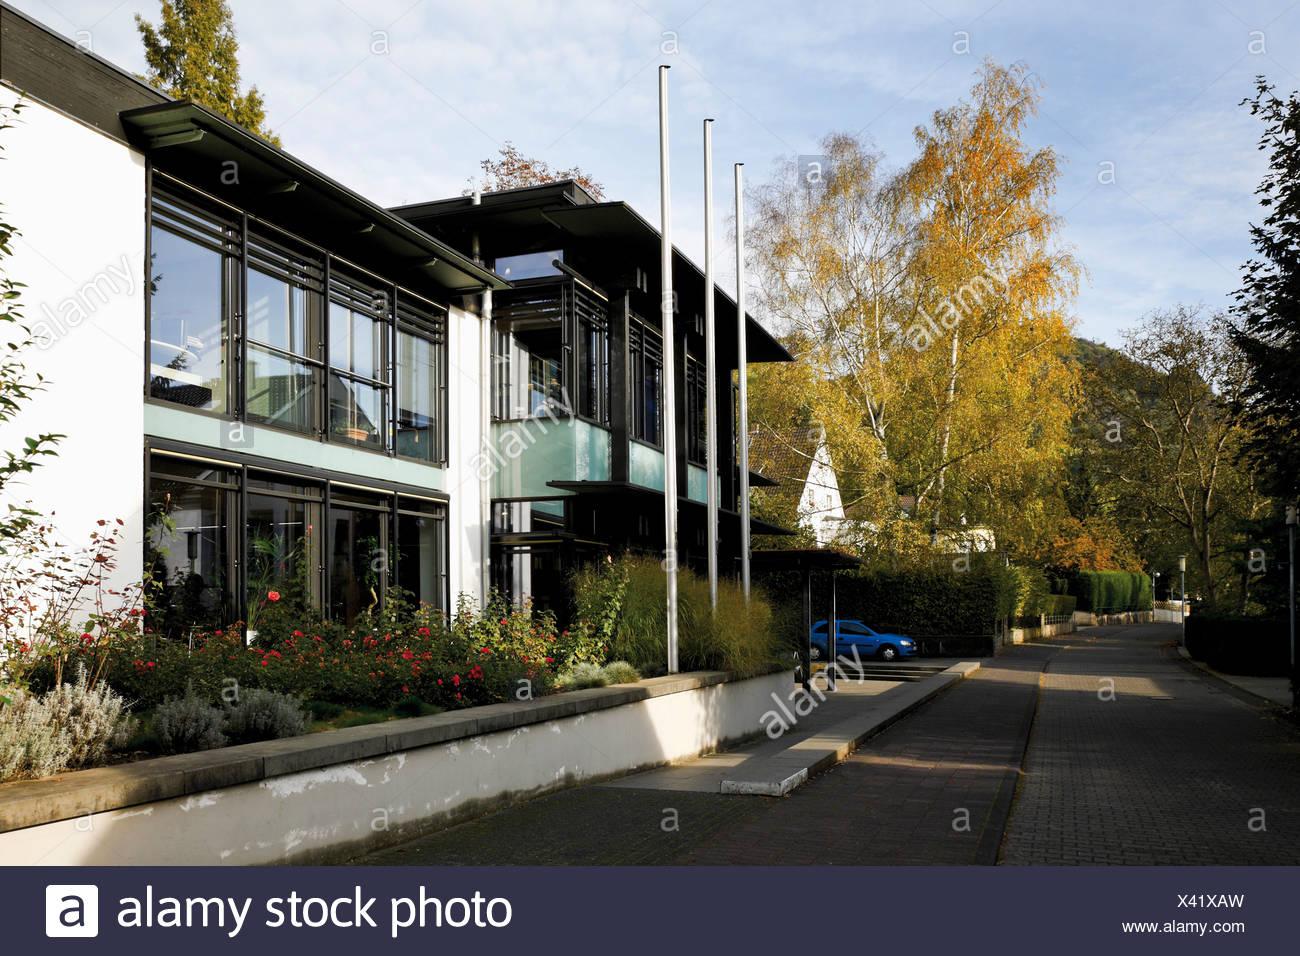 Stiftung Bundeskanzler-Adenauer-Haus Foundation Federal Chancellor Adenauer House, Rhoendorf, district of Bad Honnef, - Stock Image